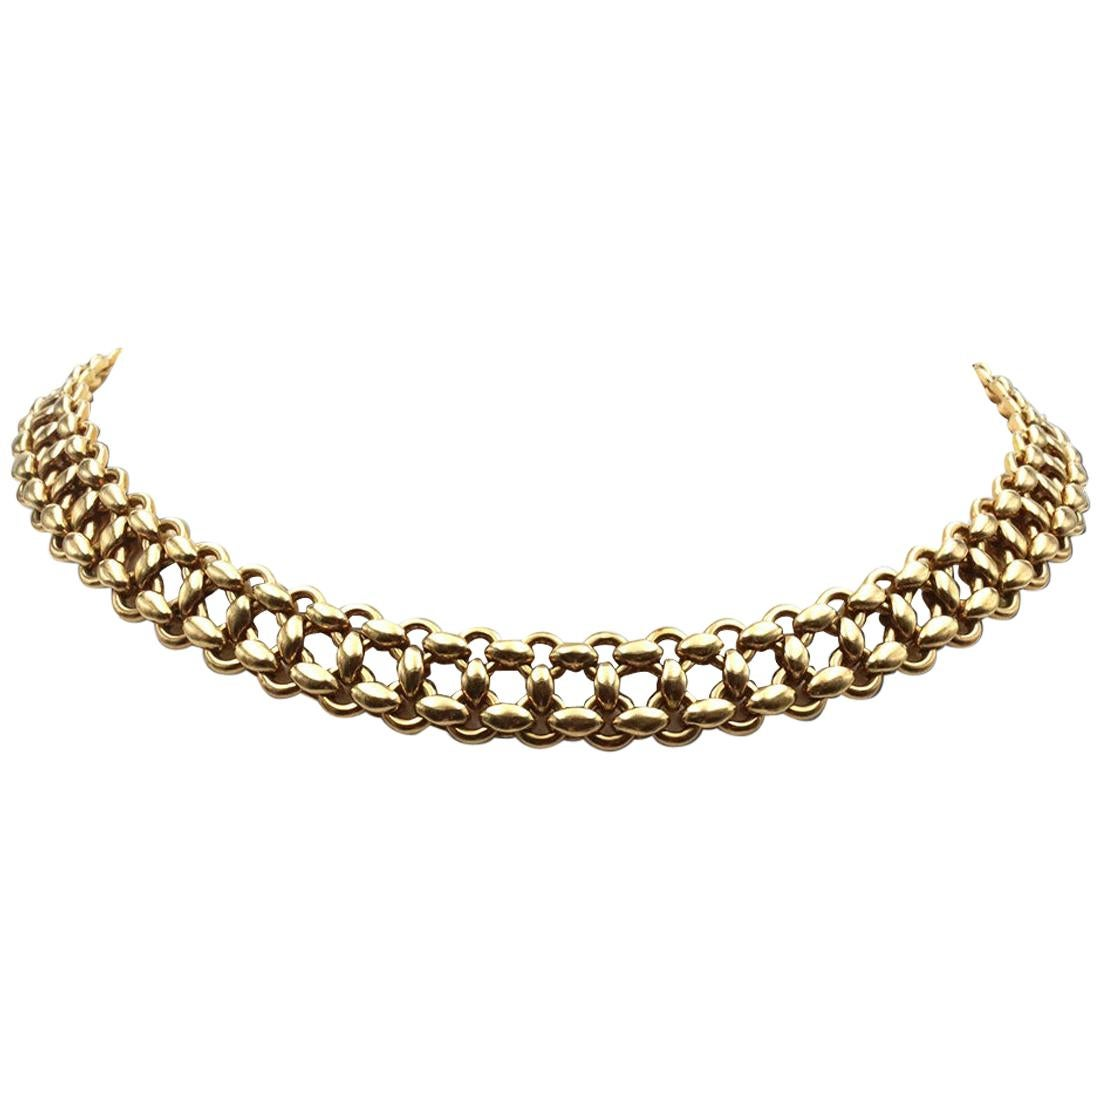 Vintage Hermès Inti Yellow Gold Necklace